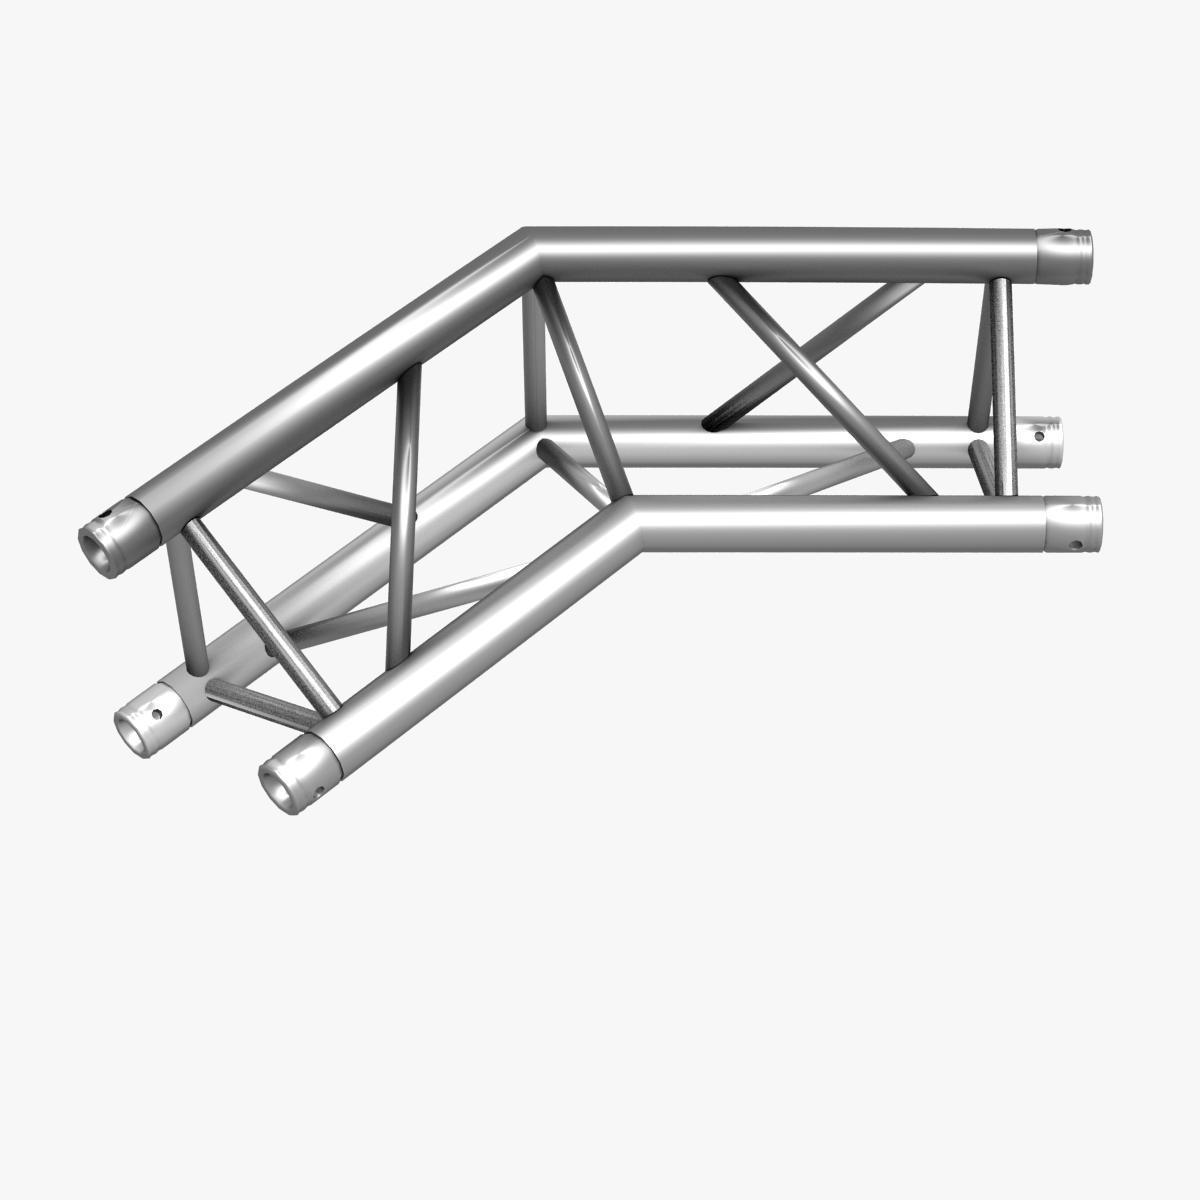 triangular trusses (collection 55 modular pieces) 3d model 3ds max dxf fbx c4d dae texture obj 216249